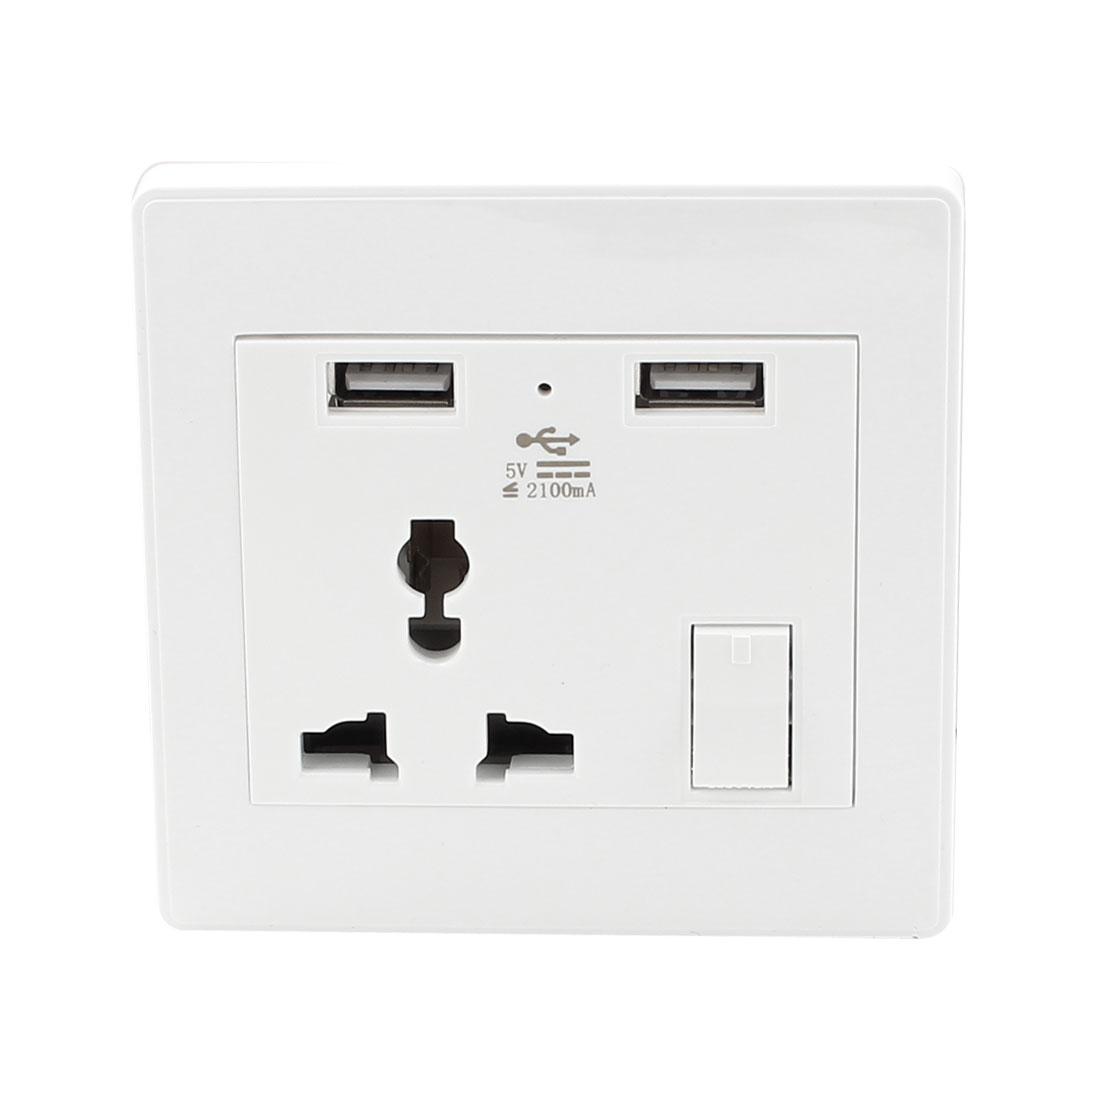 AC 110V-250V AU EU UK US Socket 2 USB Port Charger DC 5V 2100mA Mains Switch Receptacle